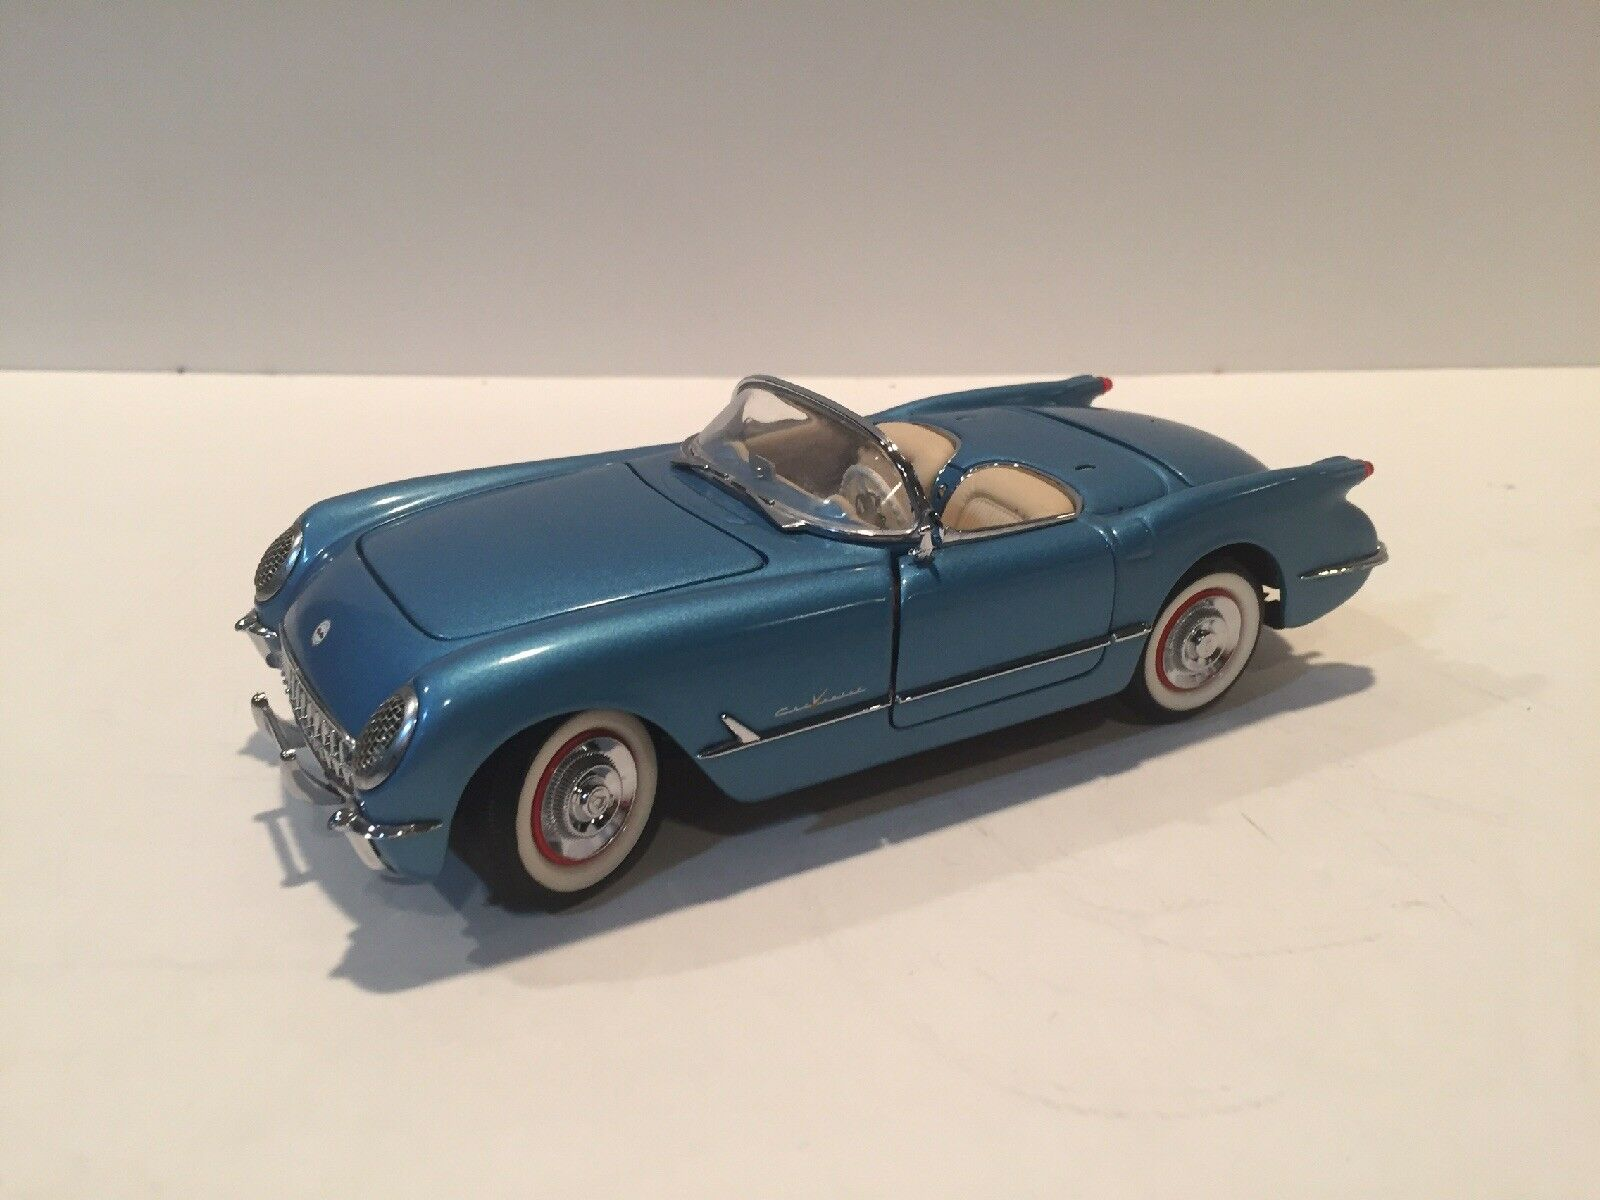 Franklin mint 1955 als blaue corvette cabrio.